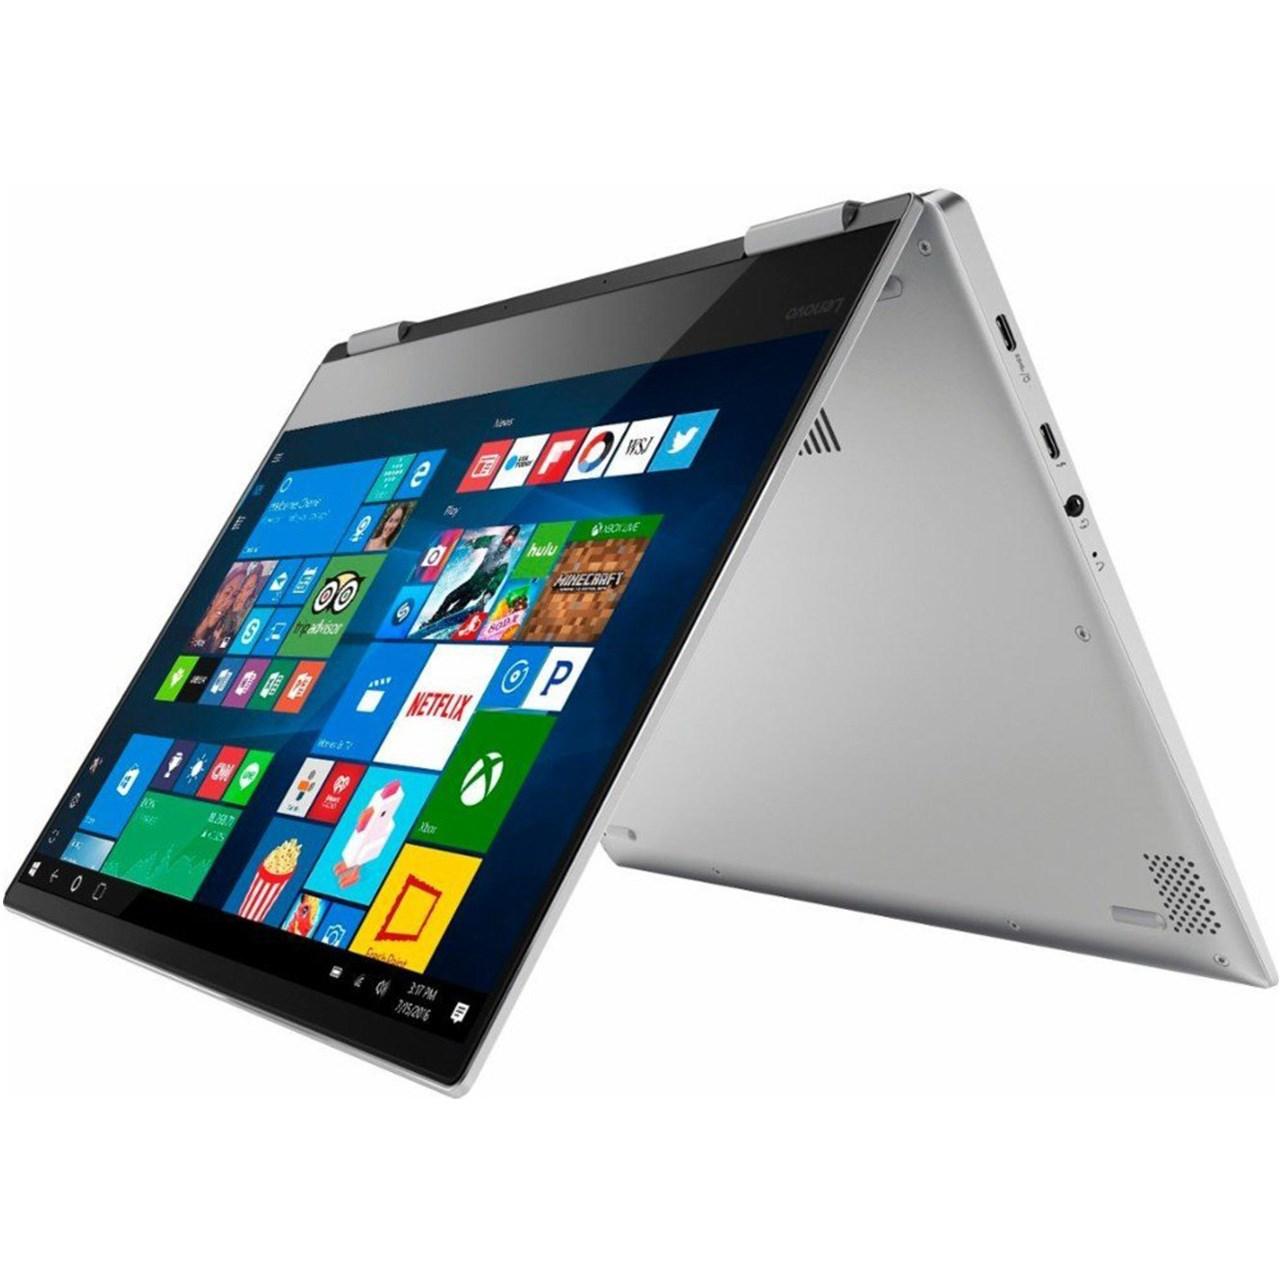 لپ تاپ 13.3 اینچی لنوو مدل Yoga 720